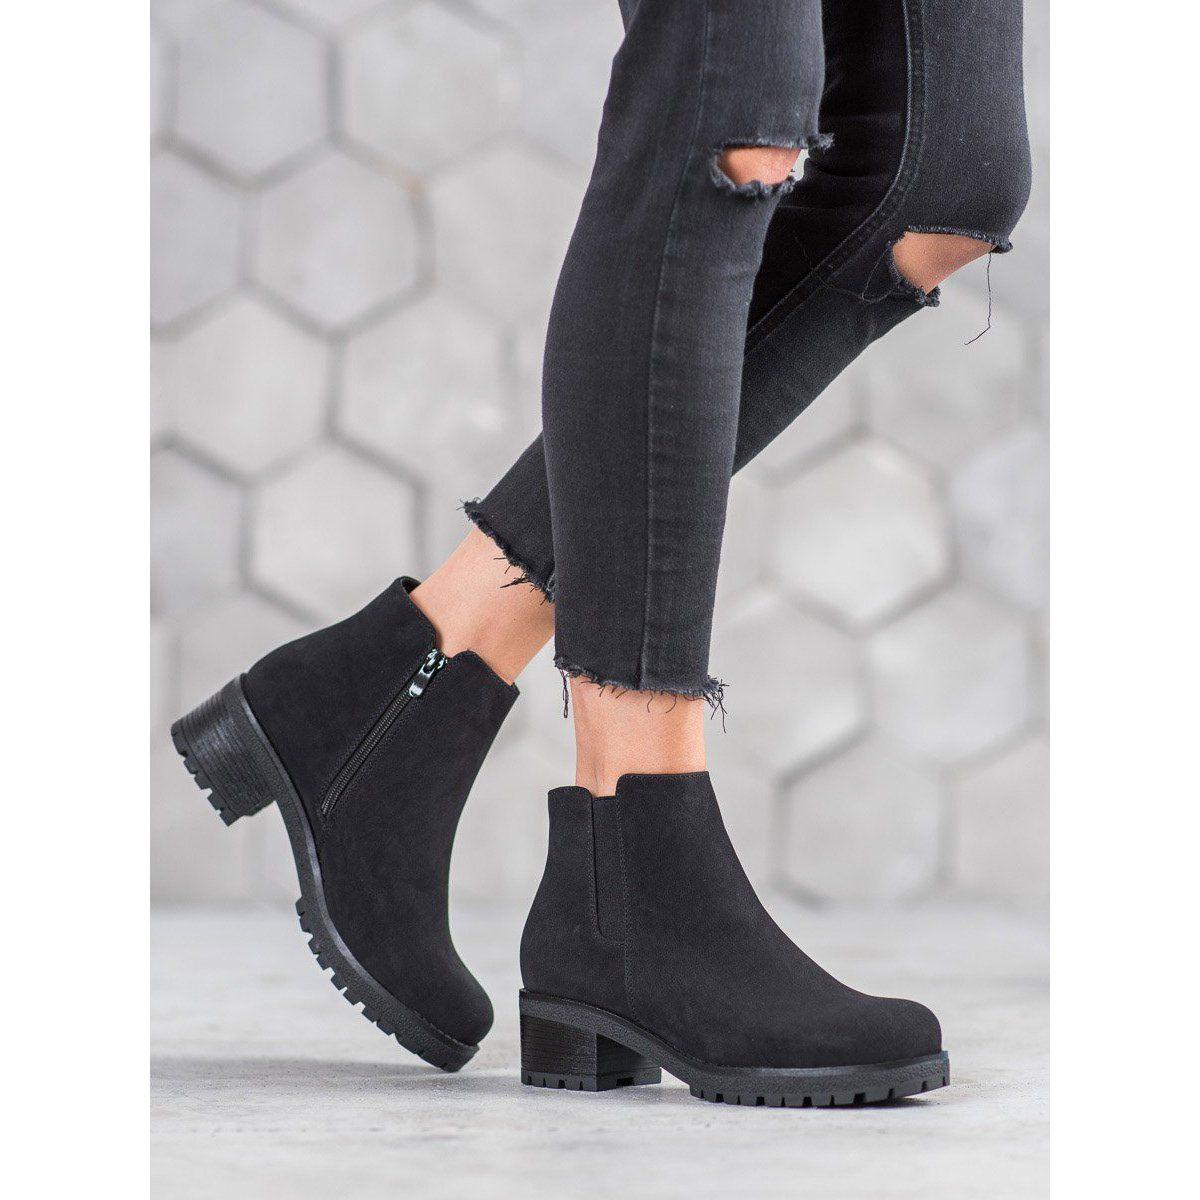 J Star Zamszowe Botki Na Platformie Czarne Elegant Boots Comfortable Womens Boots Black Suede Boots